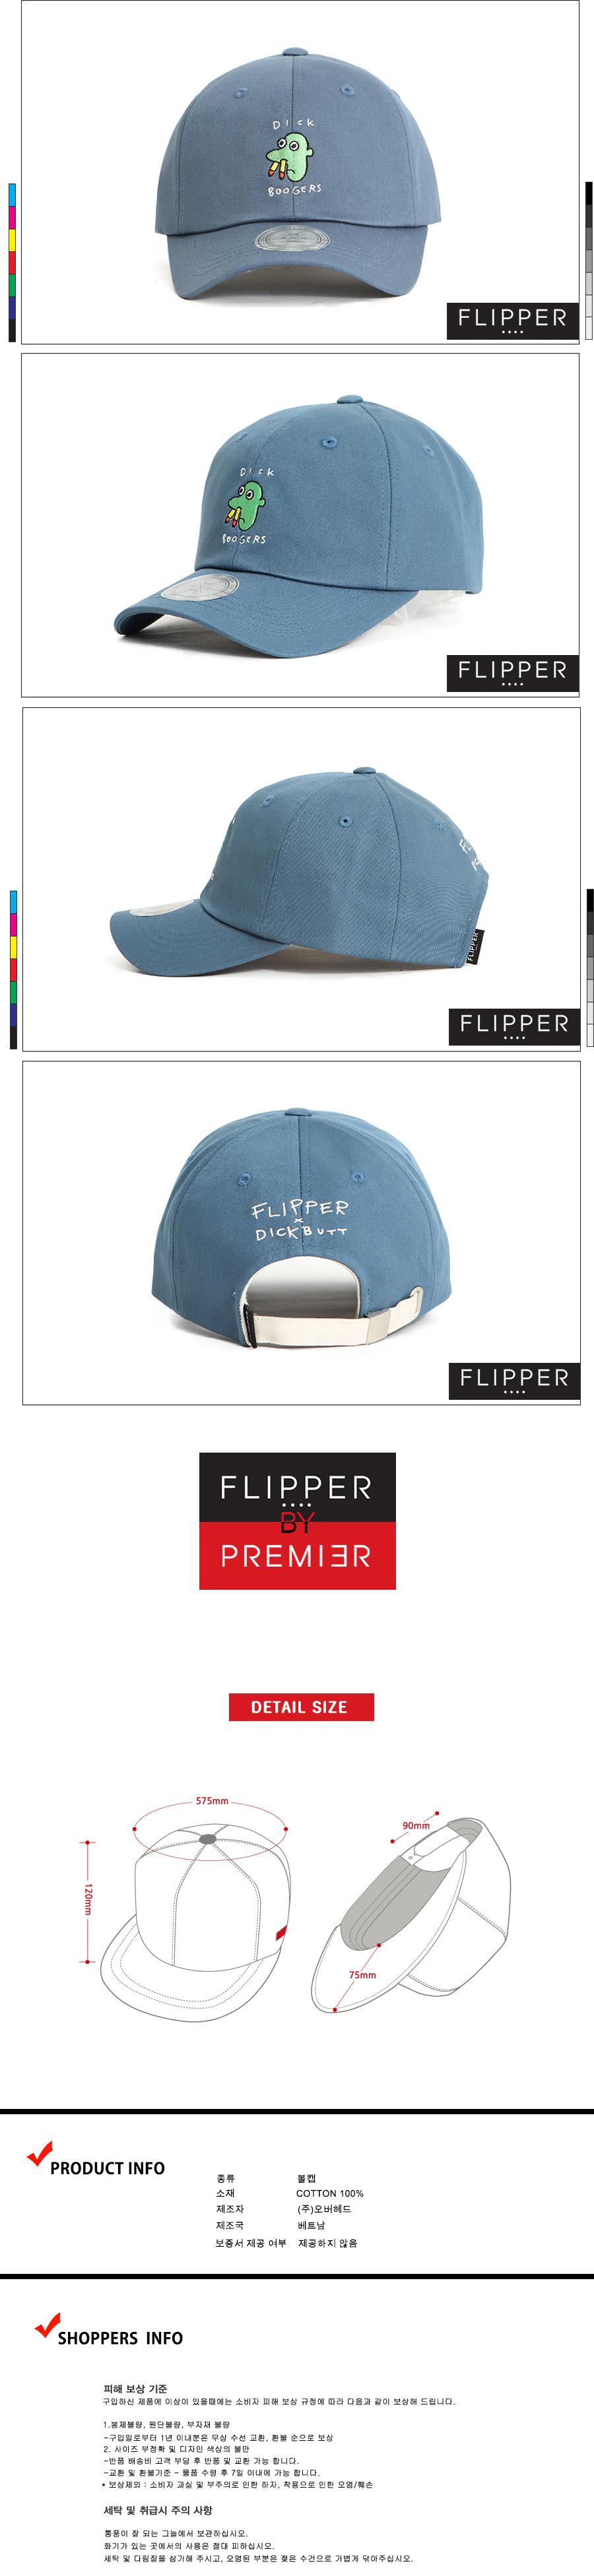 [ PREMIER ] [卓越]翻转球帽 Dick Boogers 淡蓝色(FL070)